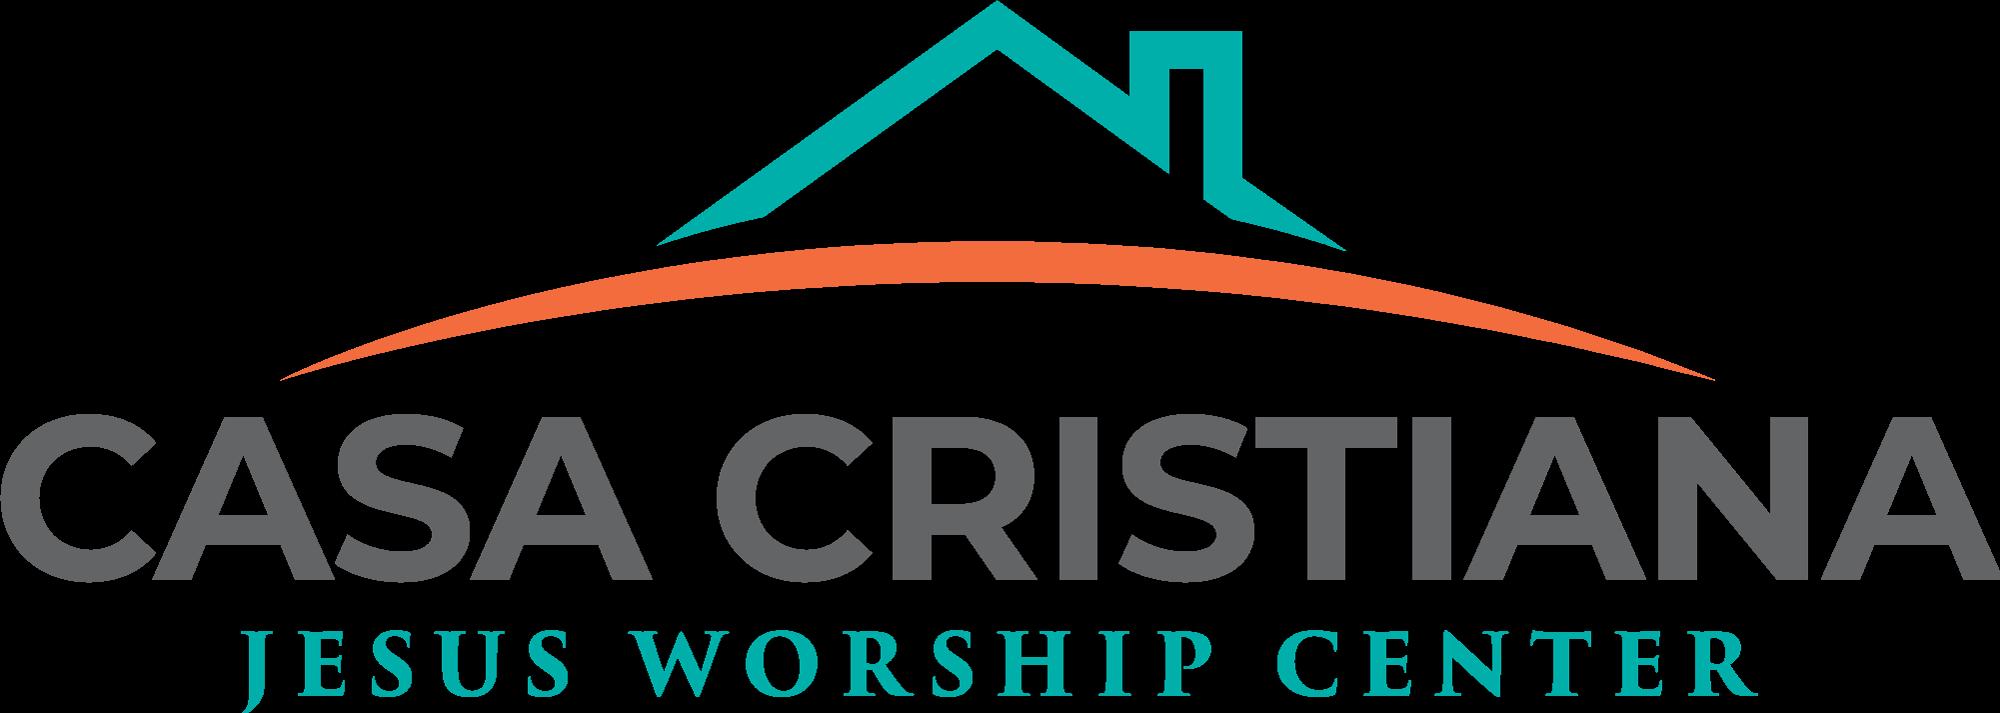 Iglesia Casa Cristiana JWC